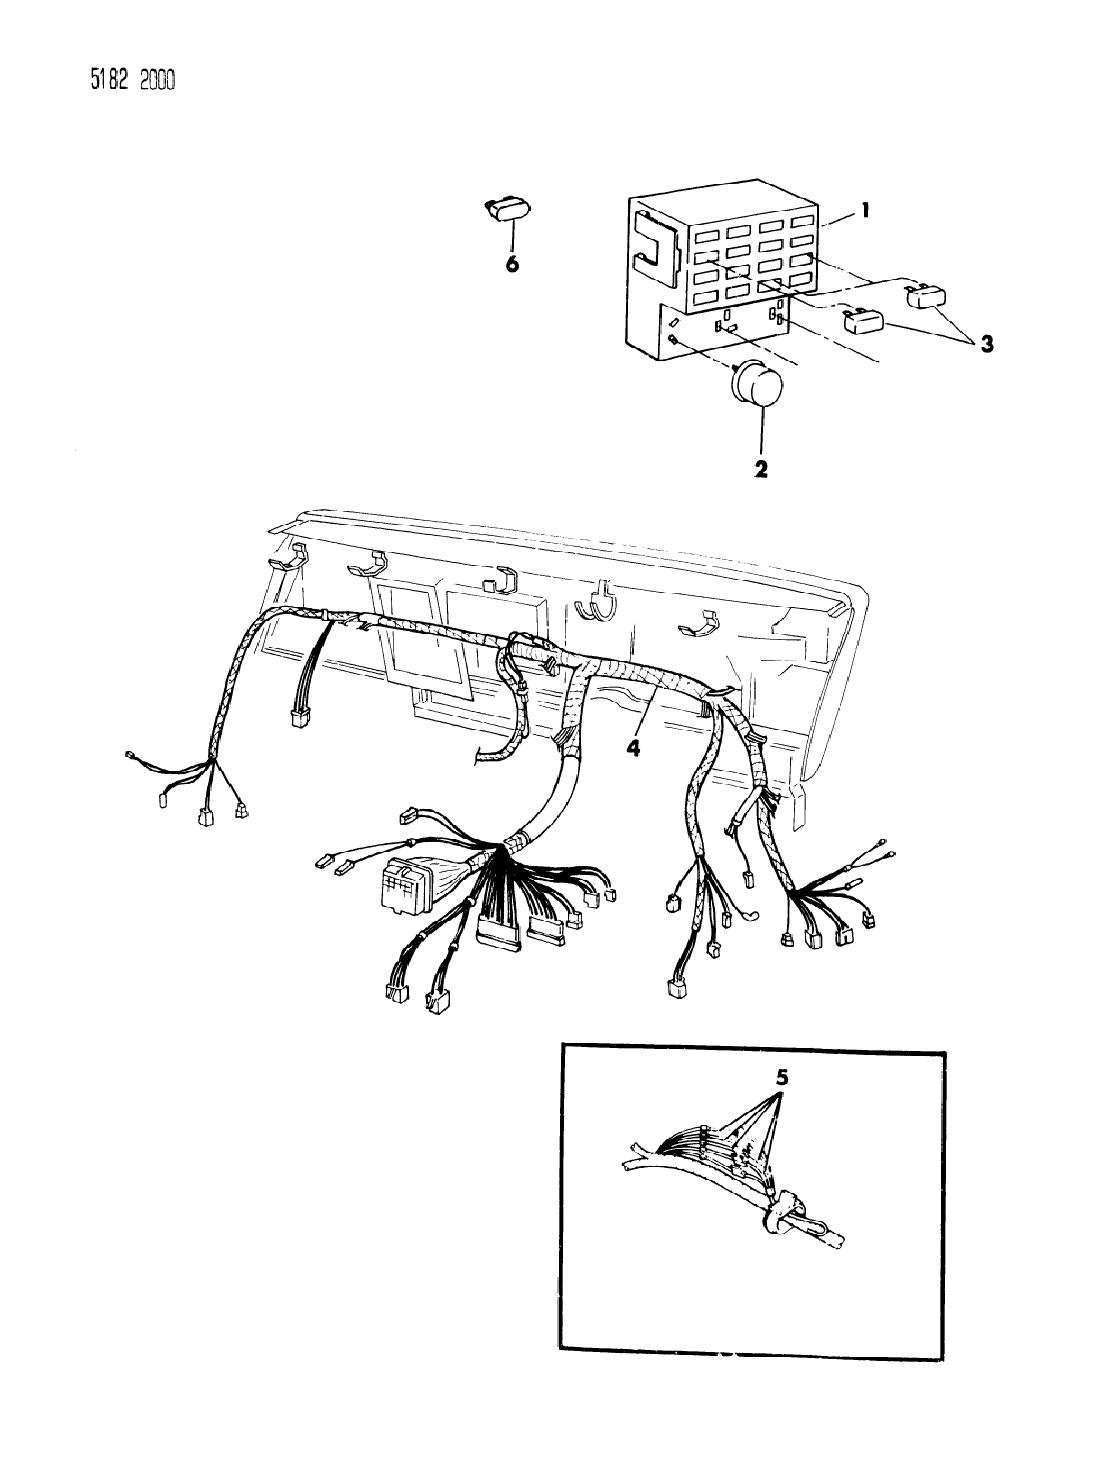 7ba901 1985 chrysler lebaron fuse box | wiring library  wiring library